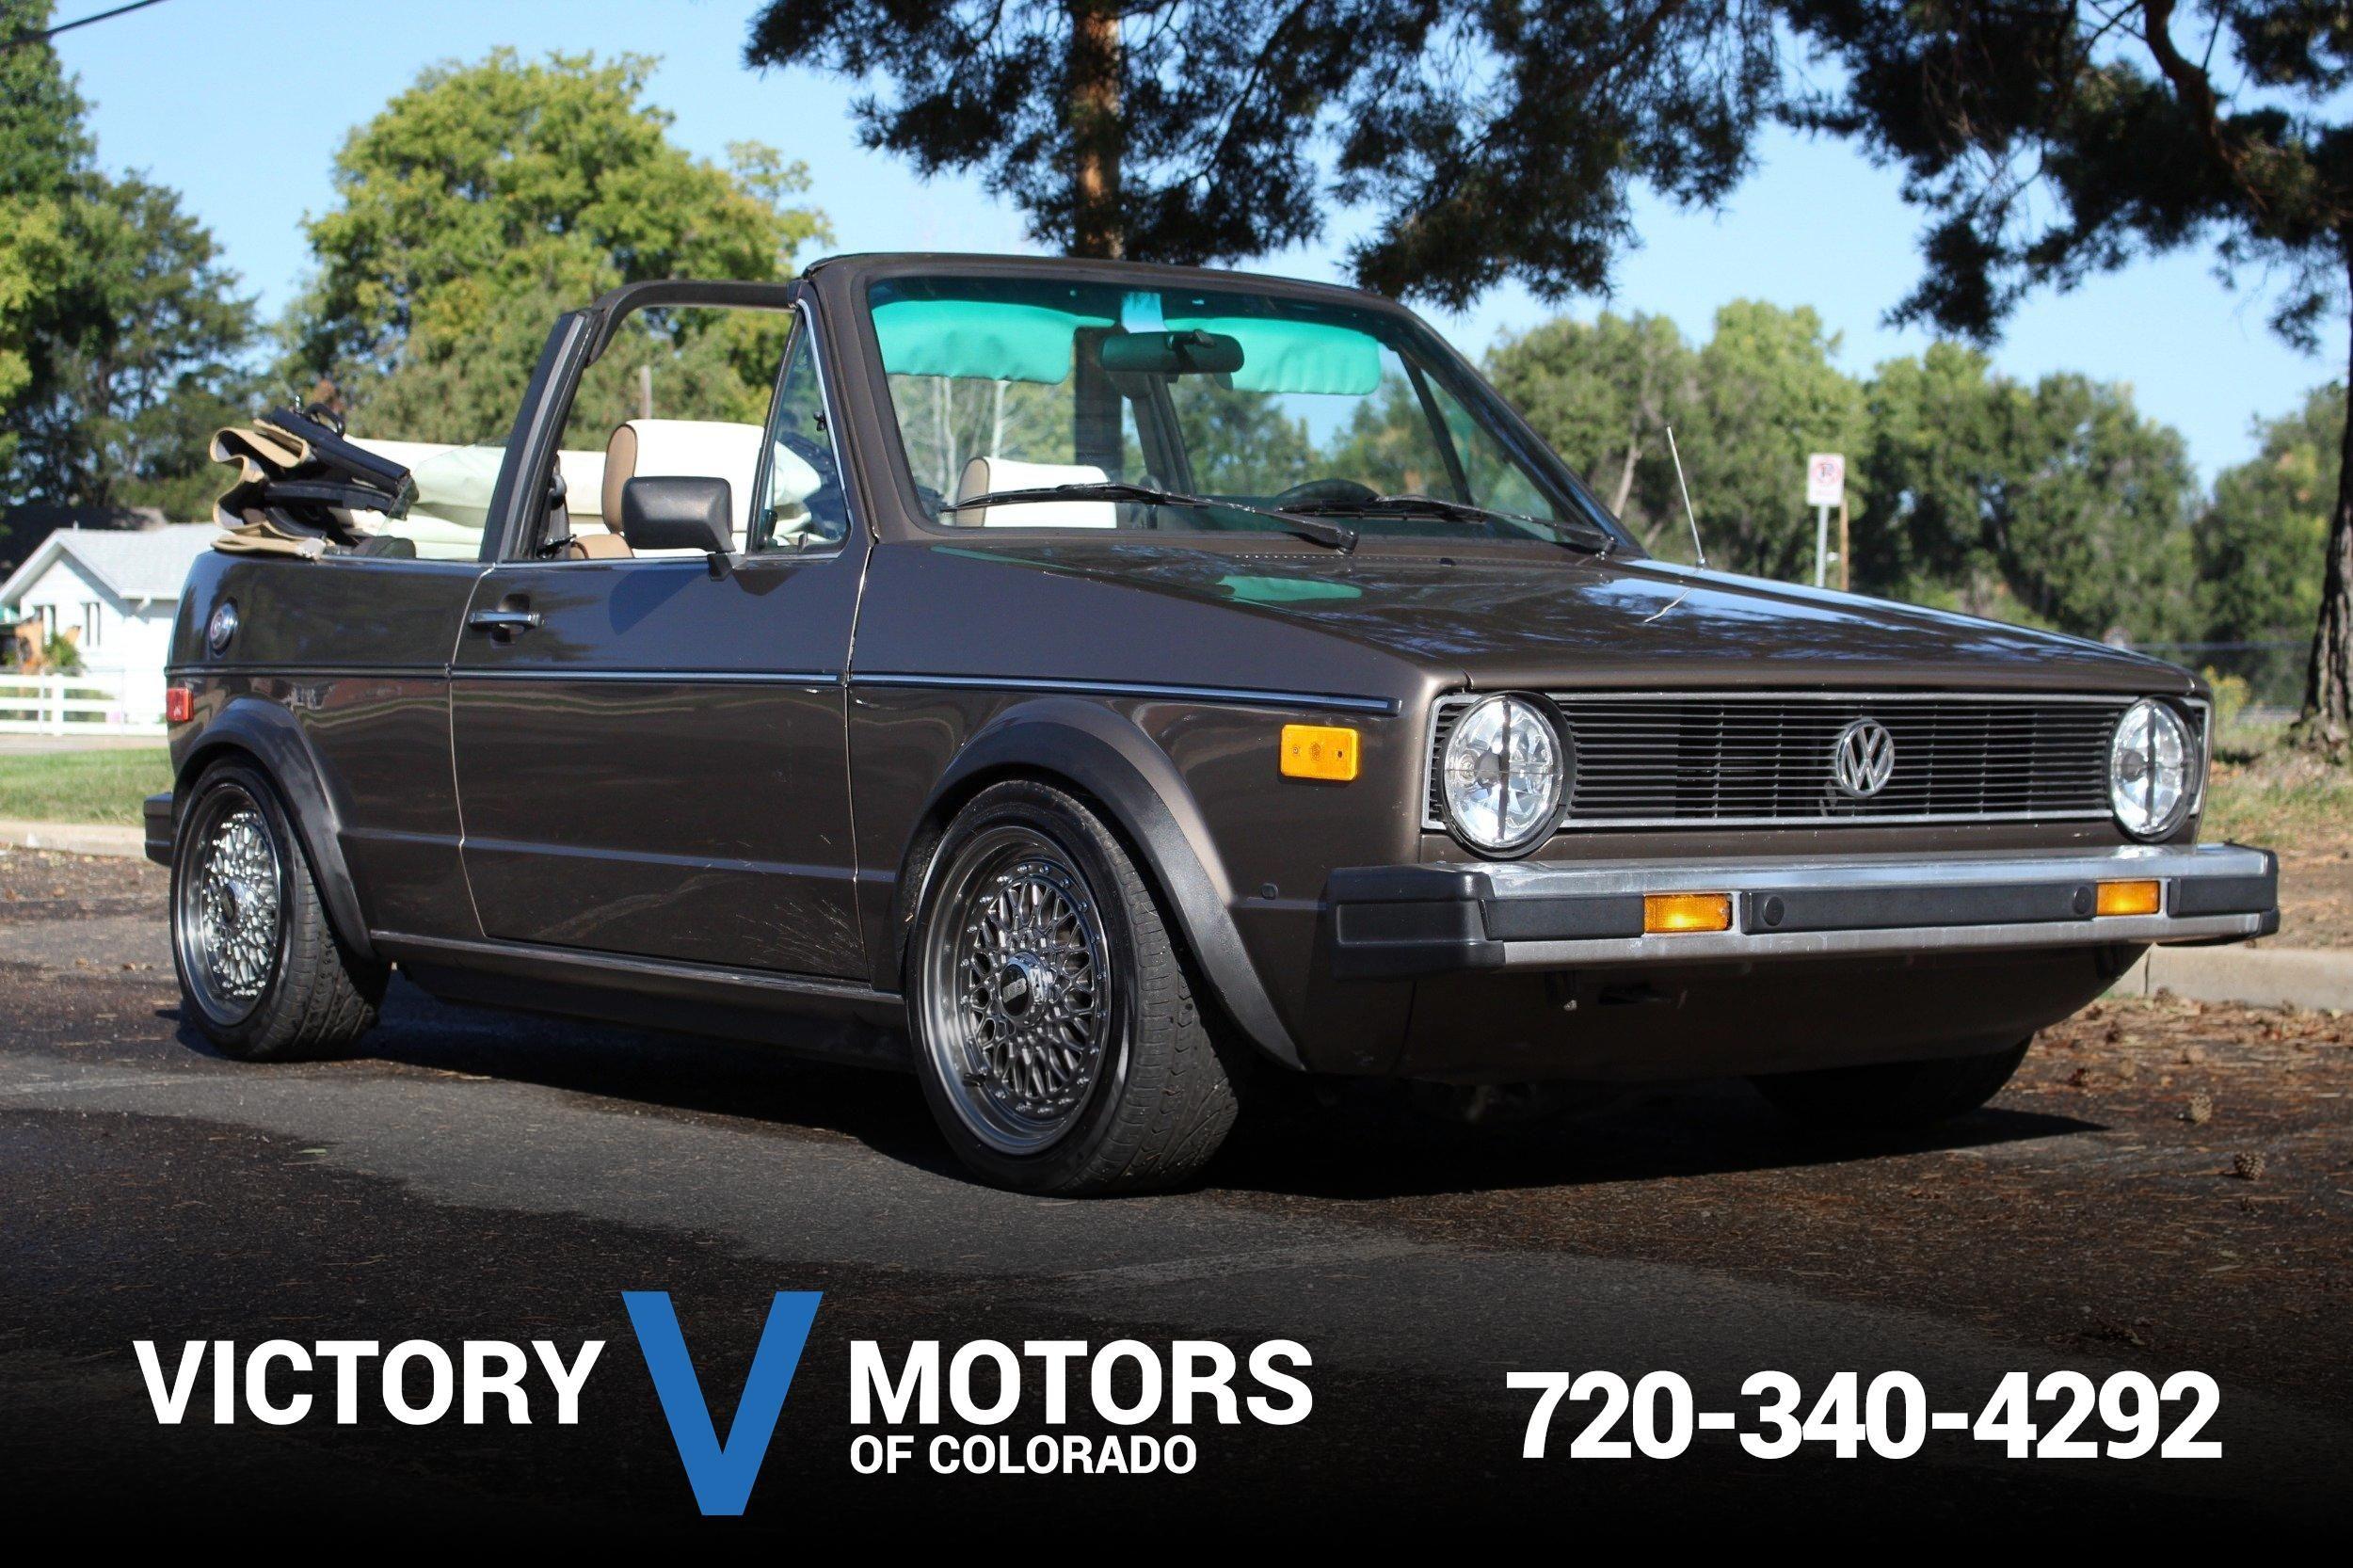 used Volkswagen Cabriolet 1987 vin: WVWCA0152HK026135